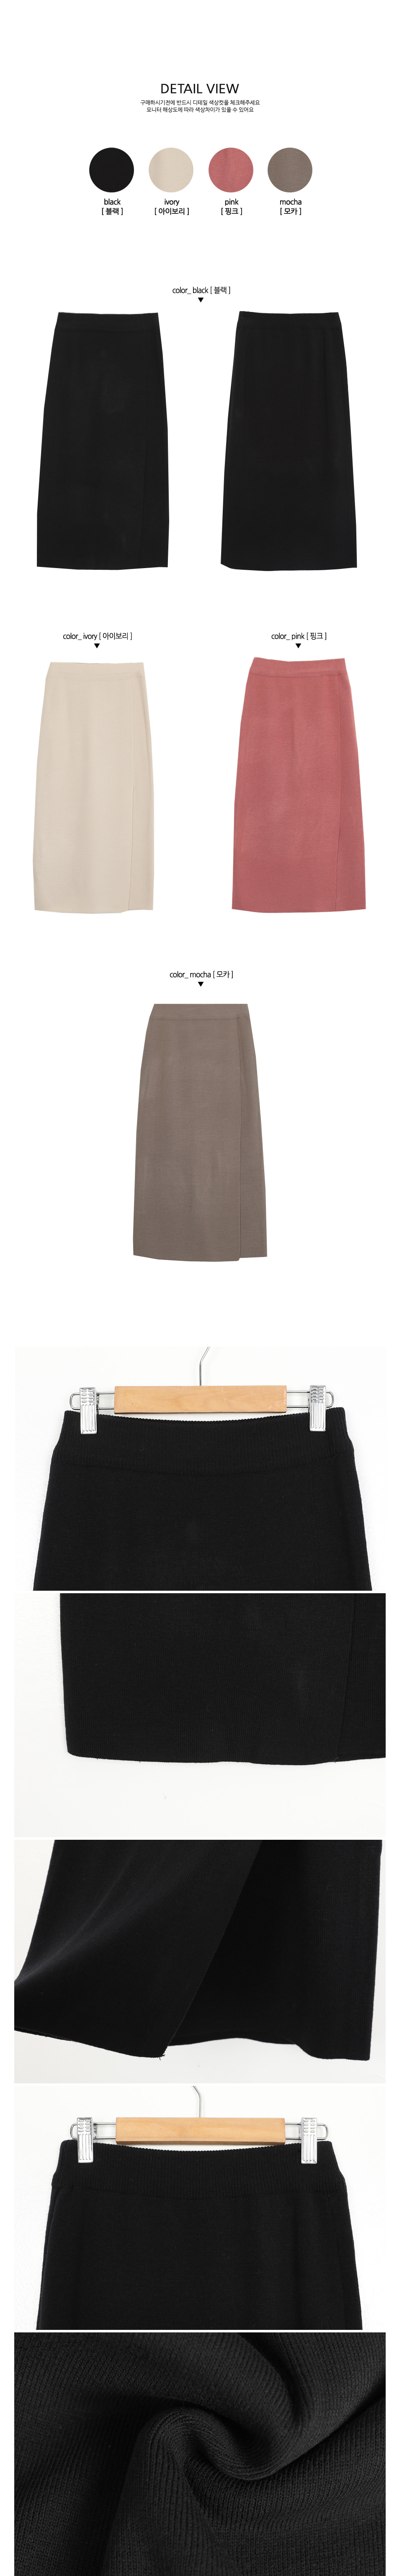 Rabbit lap knit skirt